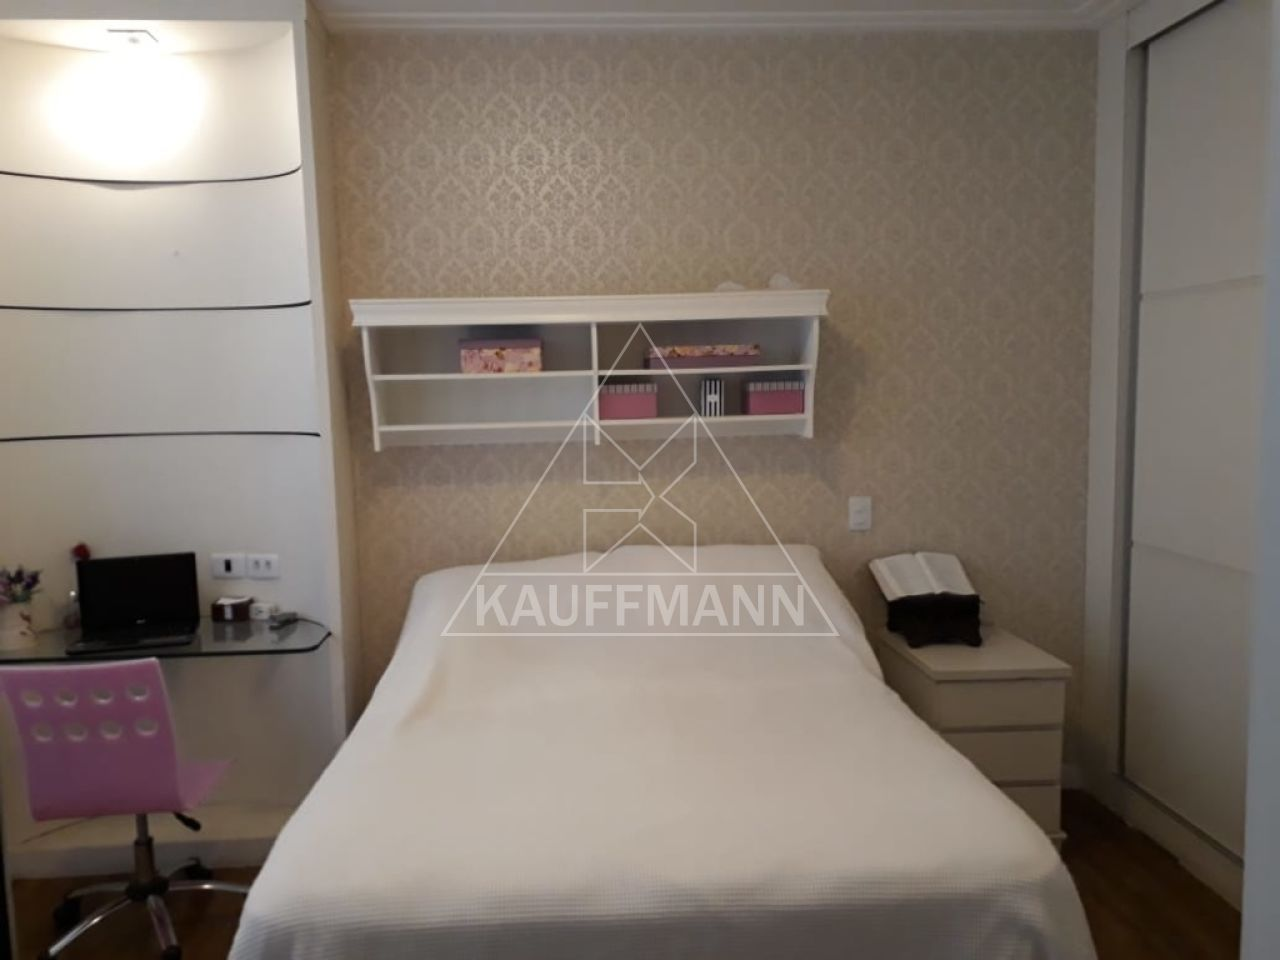 apartamento-venda-sao-paulo-jardim-paulista-3dormitorios-3suites-1vaga-174m2-Foto20